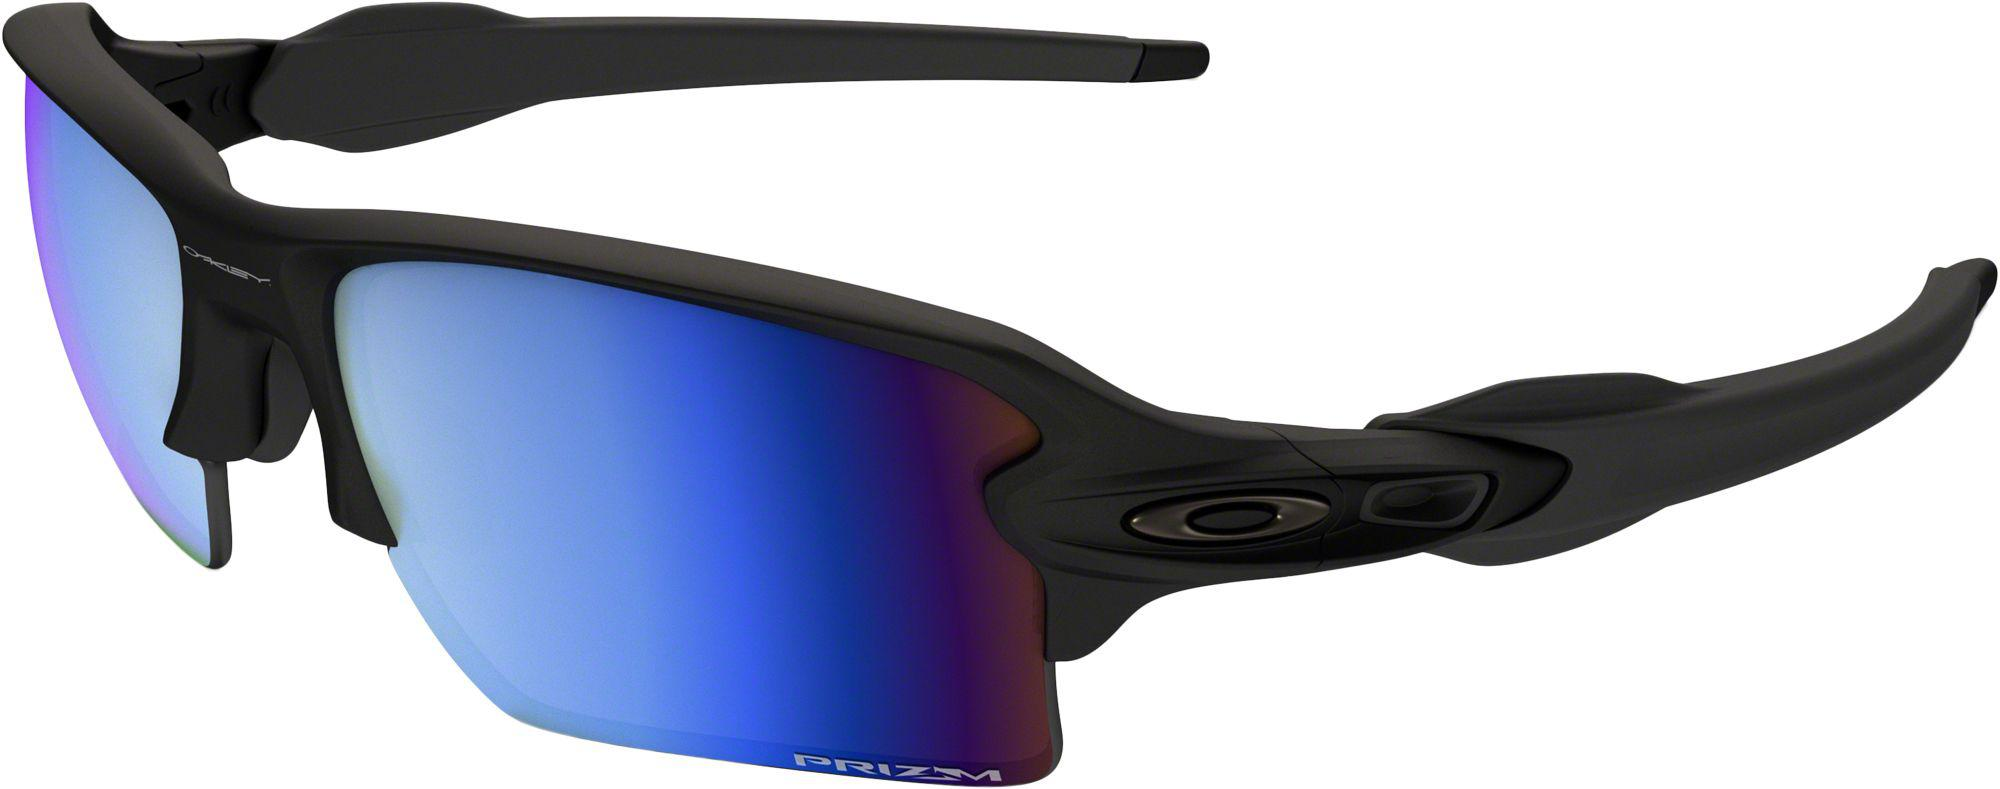 f6c09a36f2 Lyst - Oakley Flak 2.0 Xl Prizm Deep Water Polarized Sunglasses in ...